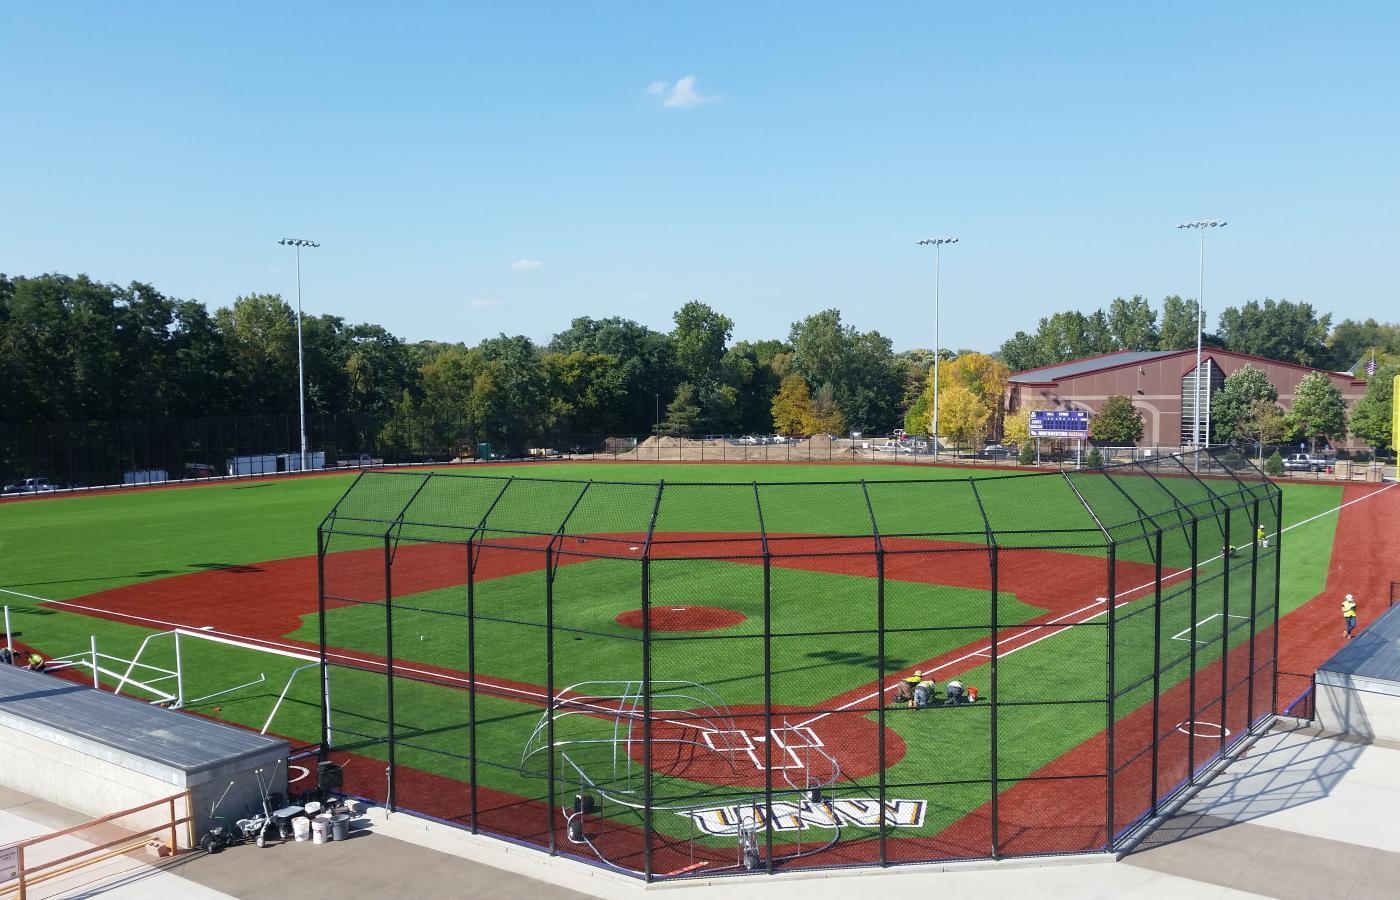 University of Northwestern Athletic Complex - 5